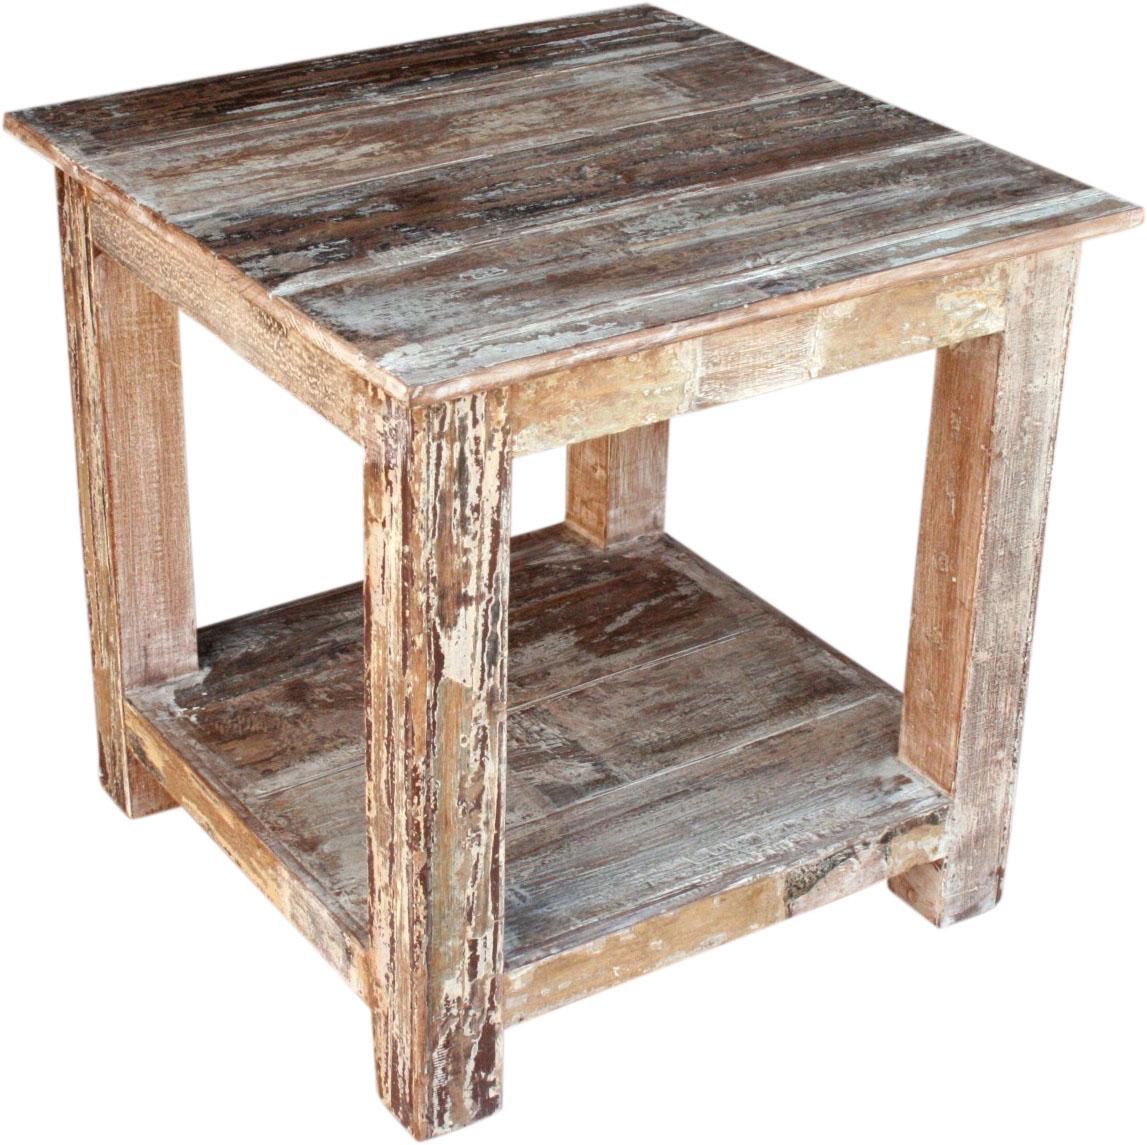 antik beistelltisch jh8 577. Black Bedroom Furniture Sets. Home Design Ideas